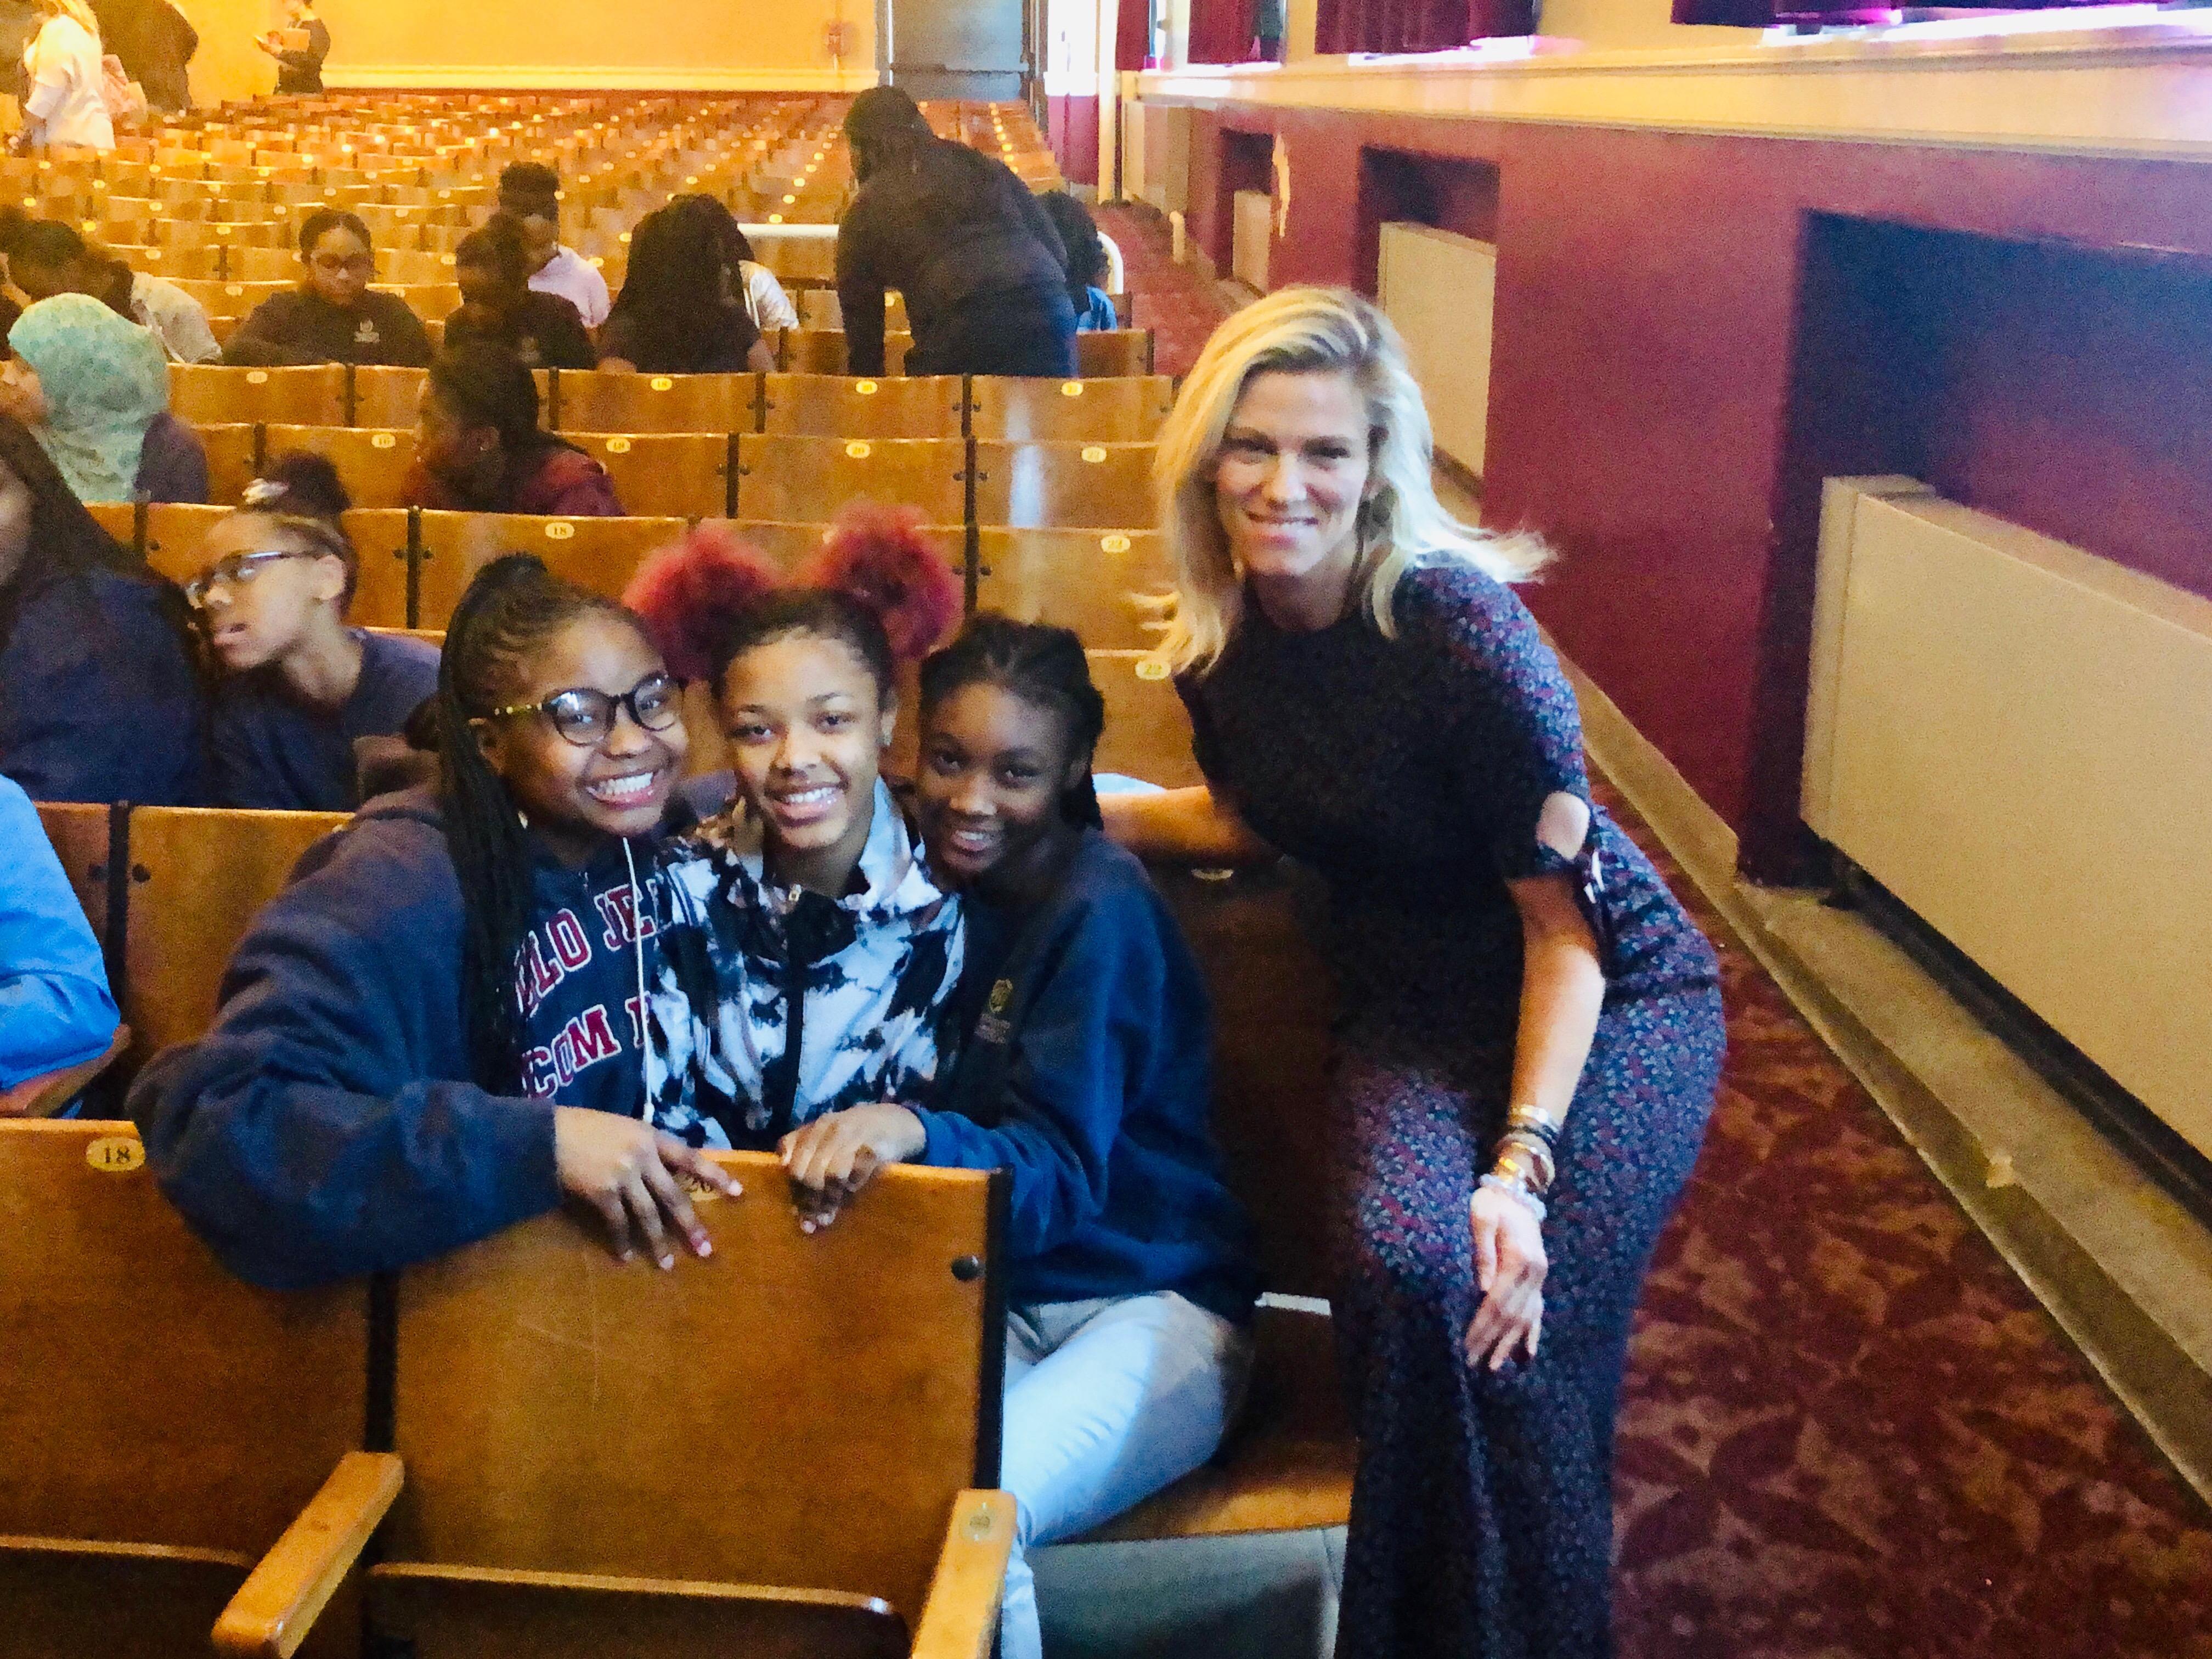 Saturday Night Live producer Lindsay Shookus talks kindness, empowerment to girls at Buffalo school